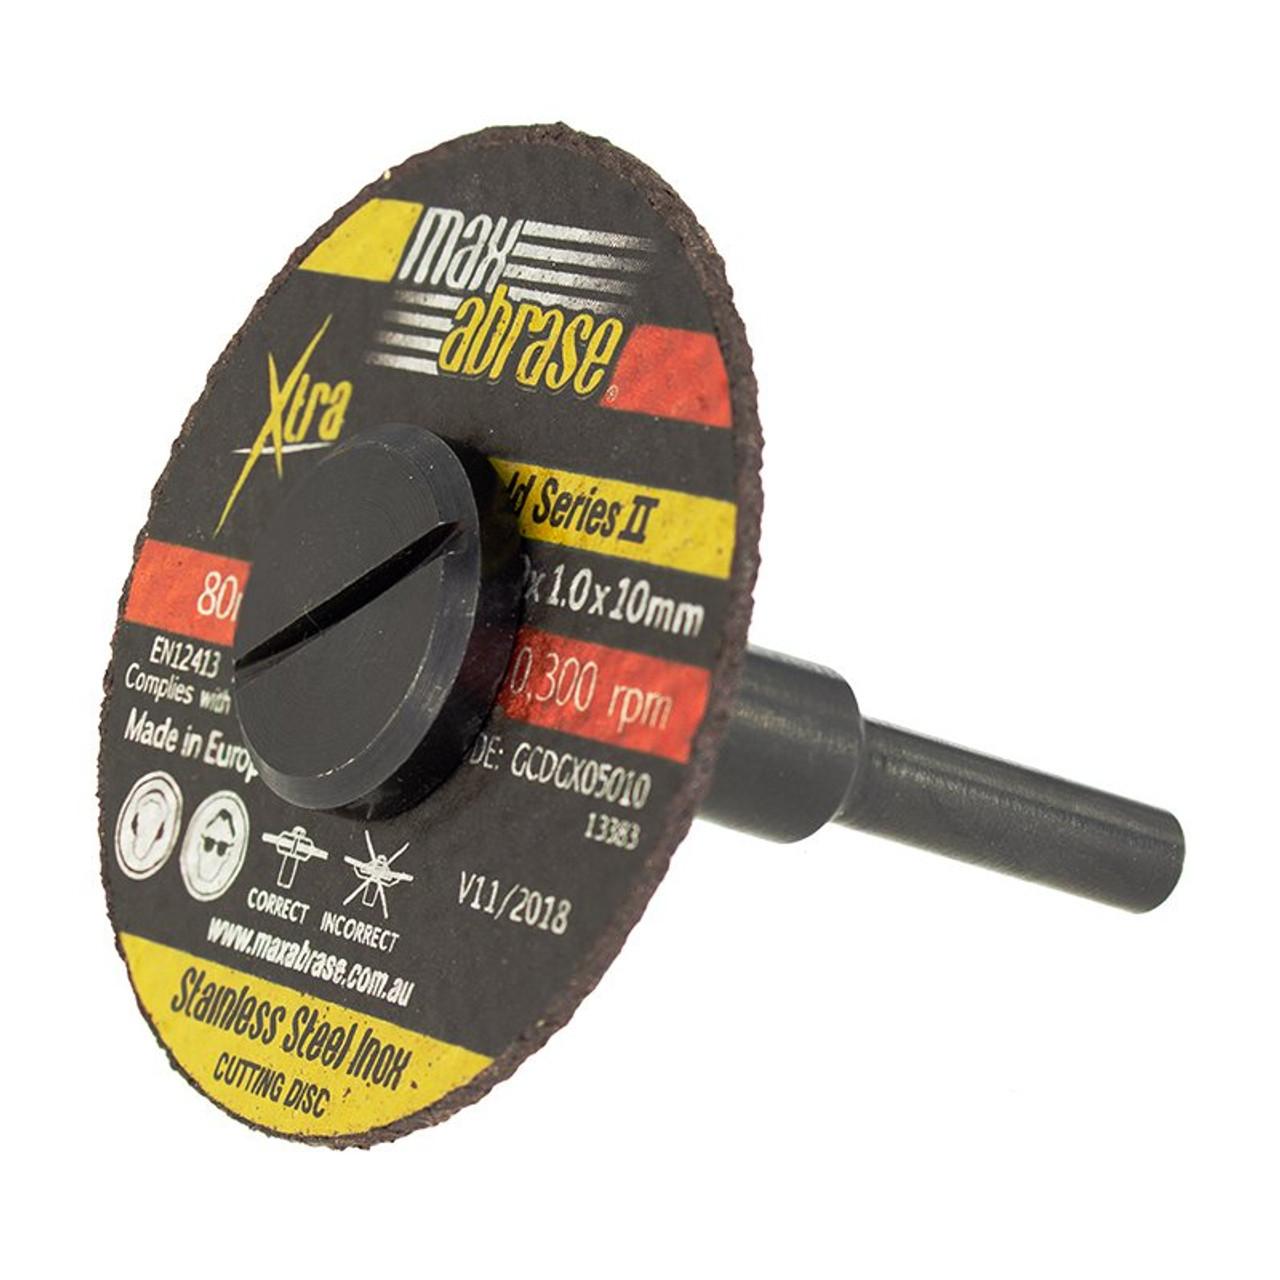 Cutting disc mandrel to suit die grinders etc